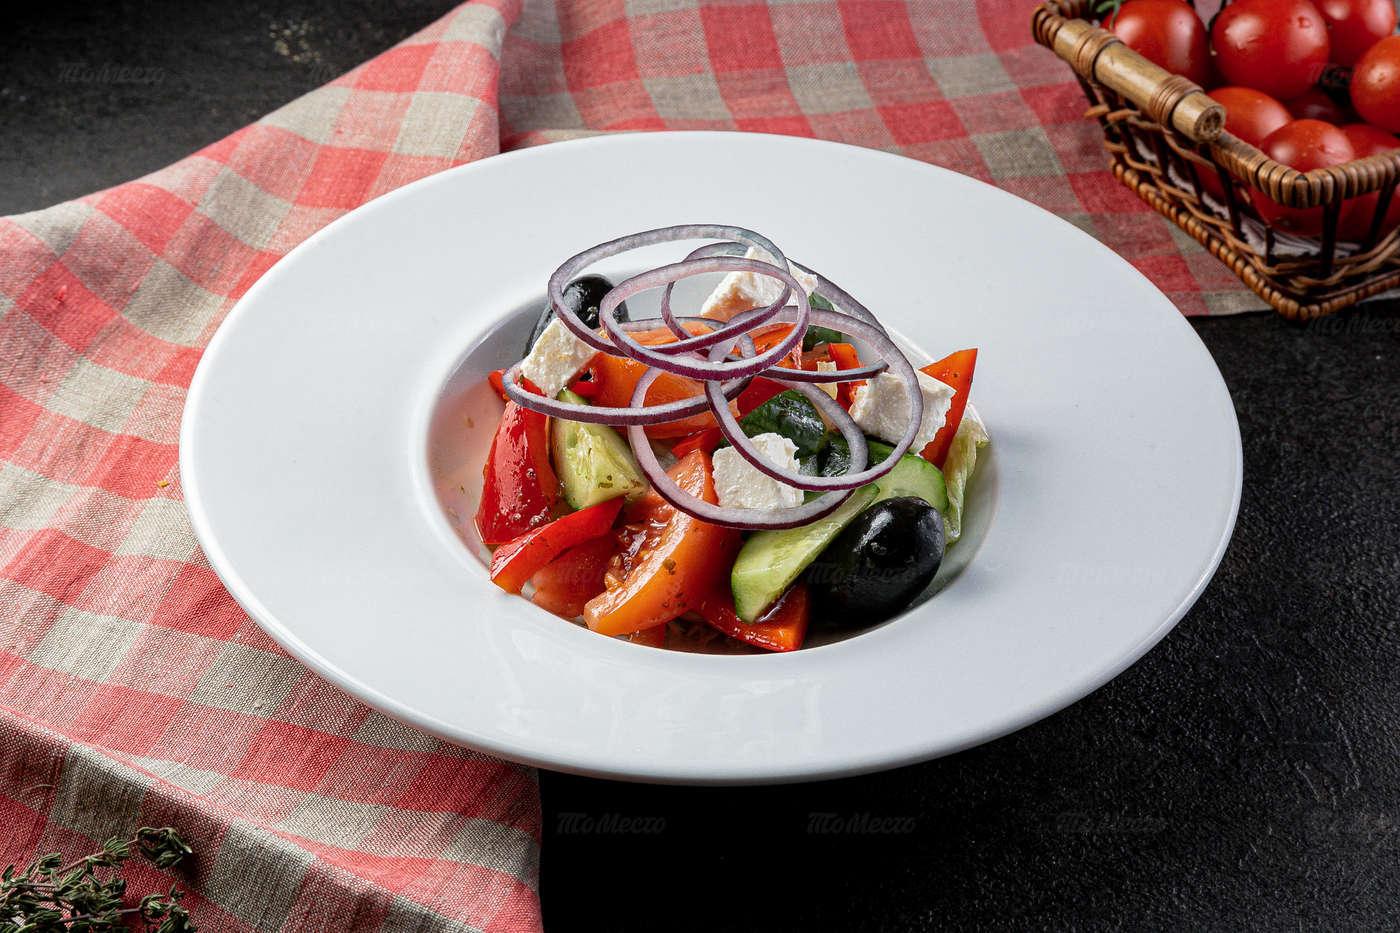 Меню ресторана Папа Пицциано (Papa Pizziano) на Новочеркасском проспекте фото 21